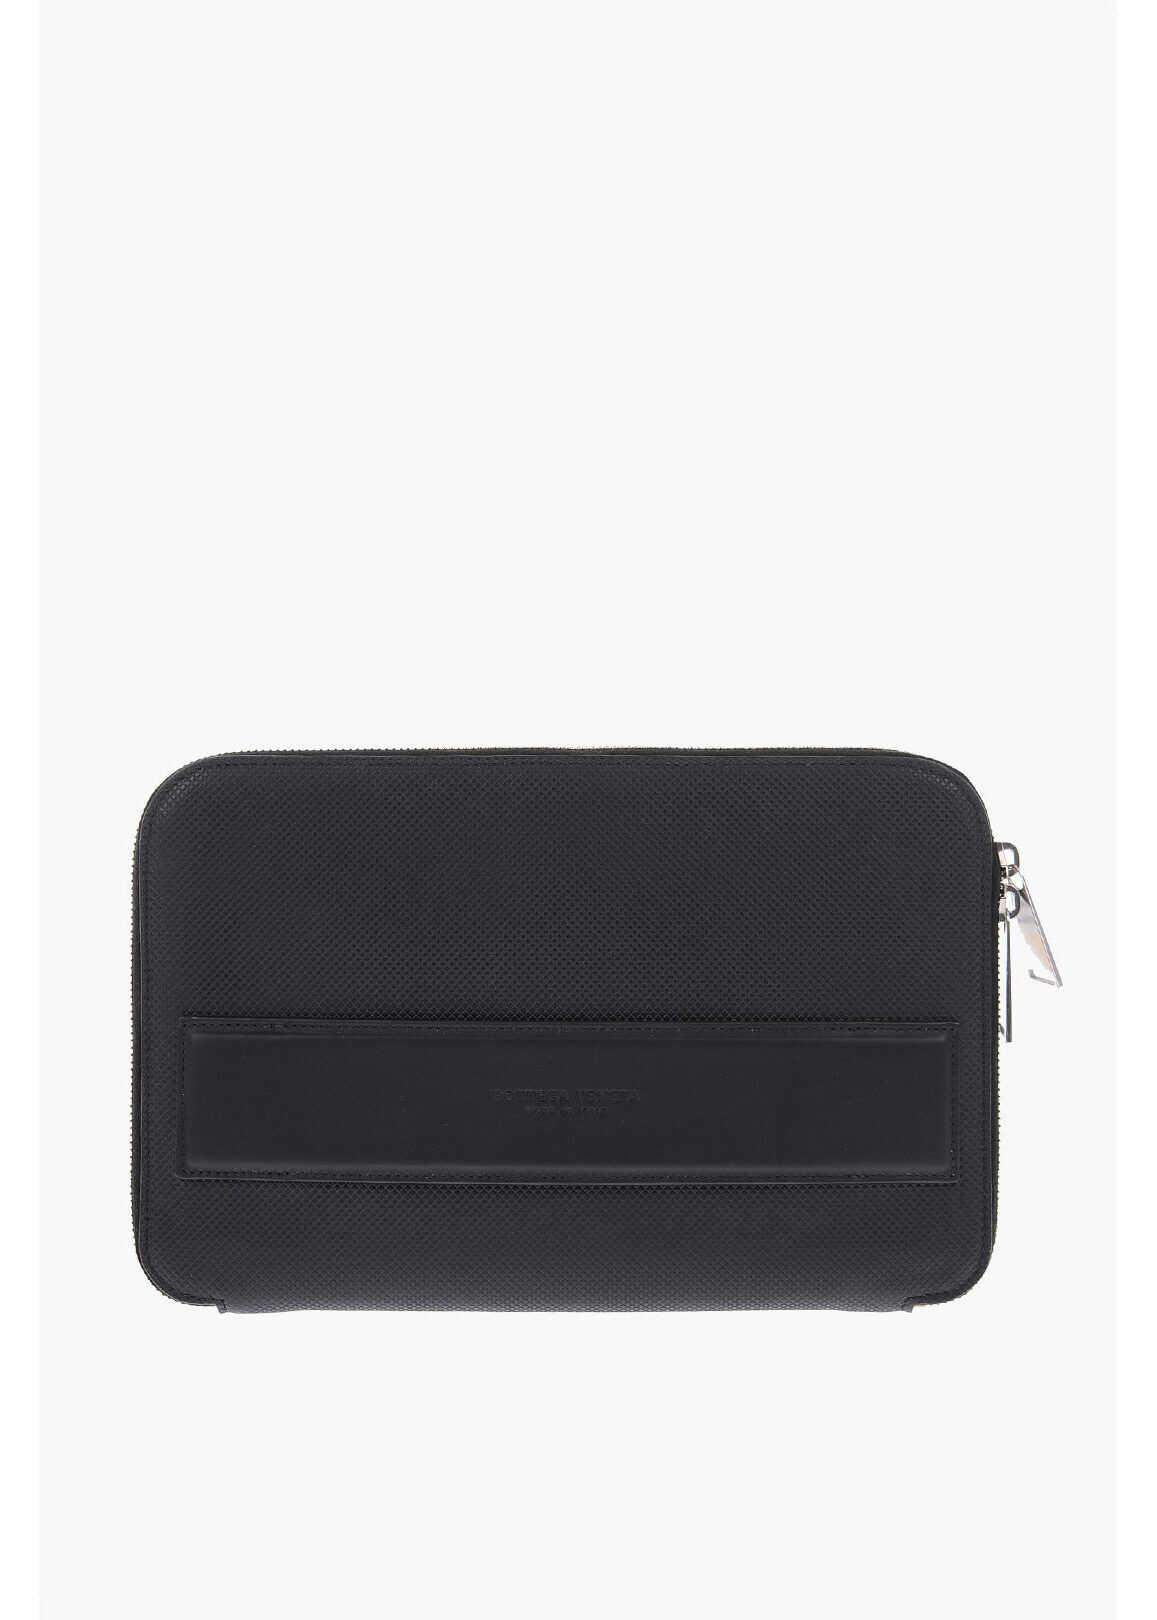 Bottega Veneta Leather MARCO POLO Briefcase BLACK imagine b-mall.ro